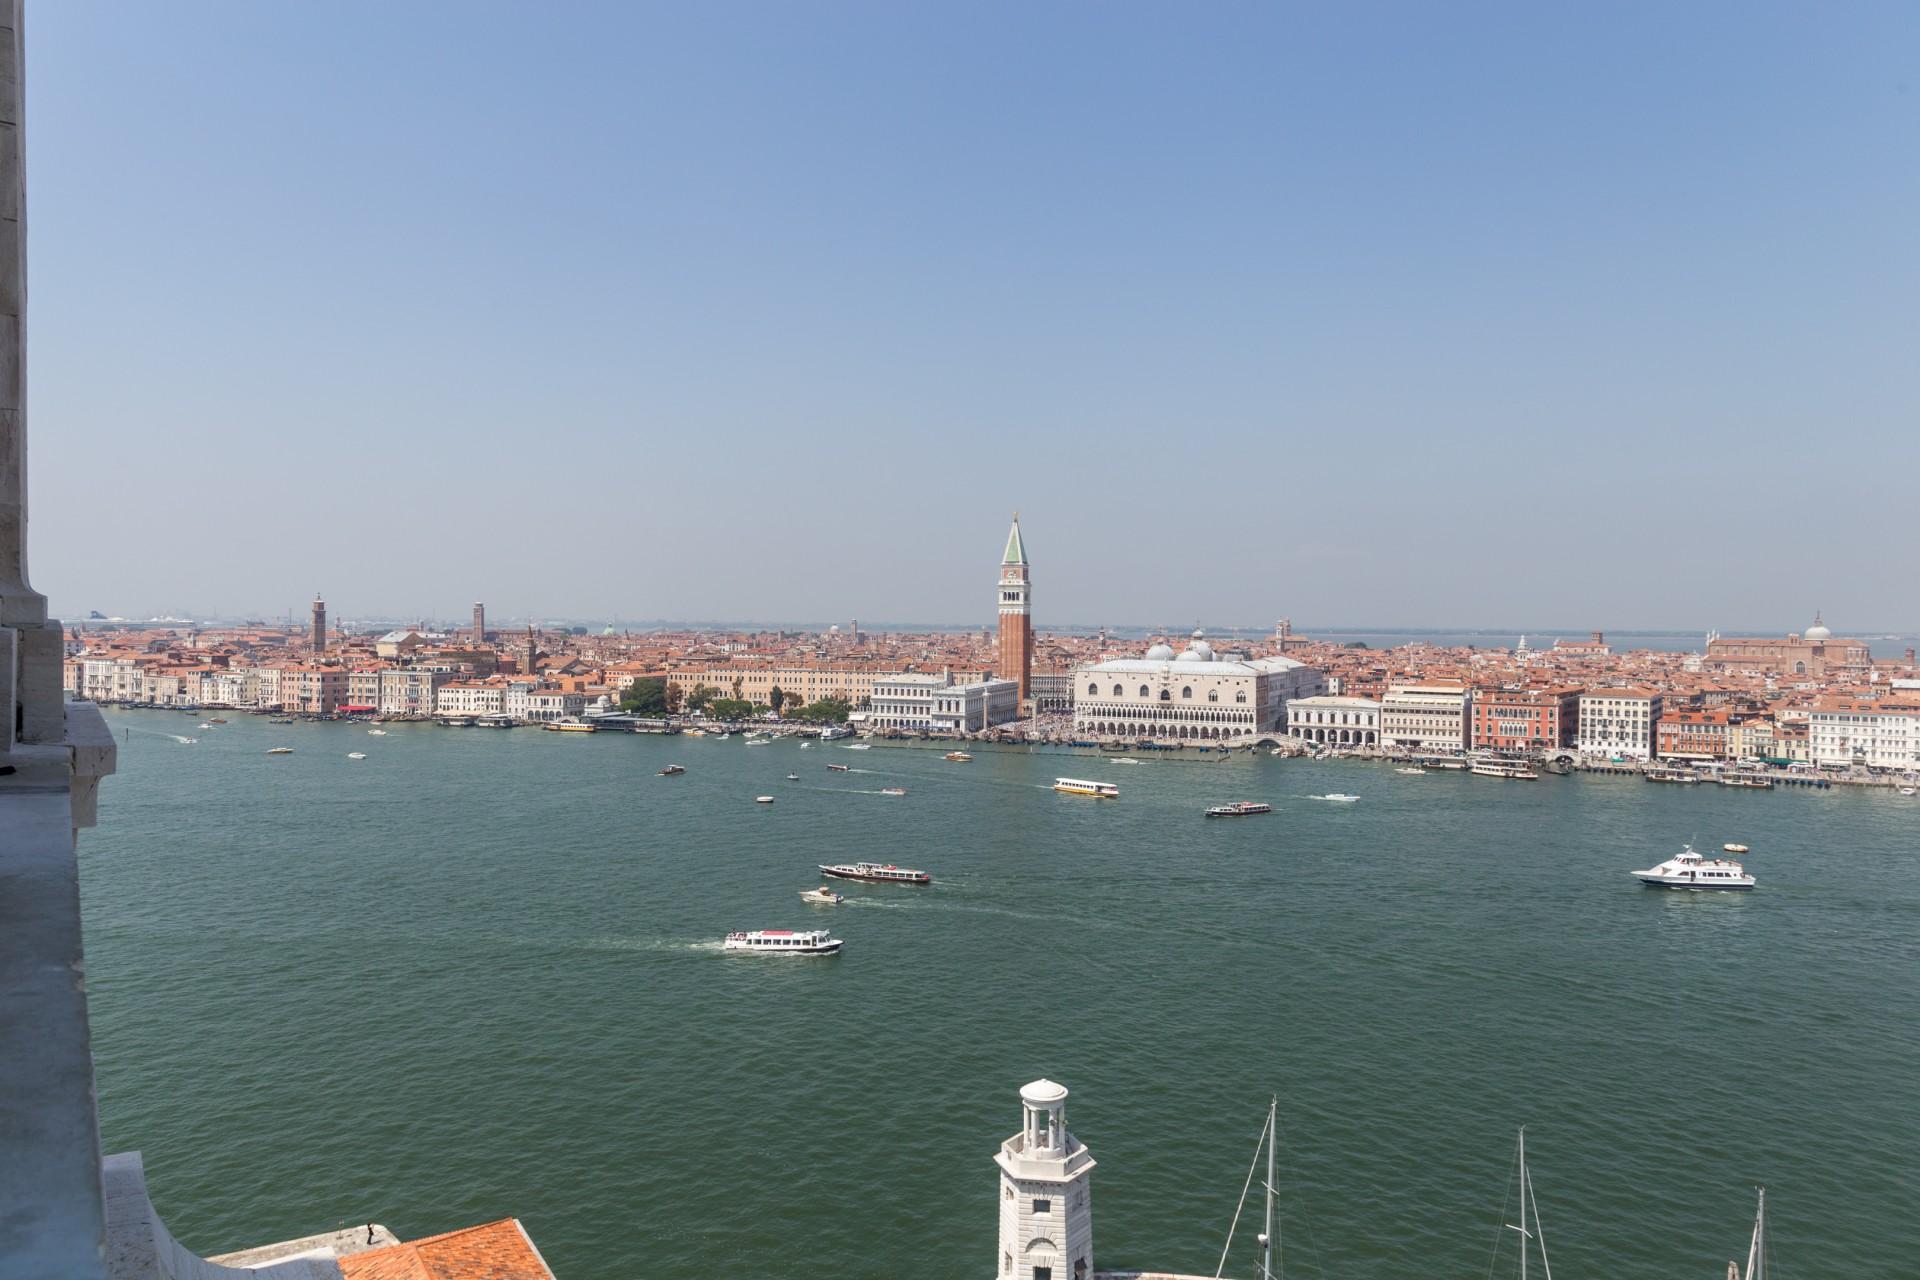 Blick auf Venedig von San Girogio Maggiore aus